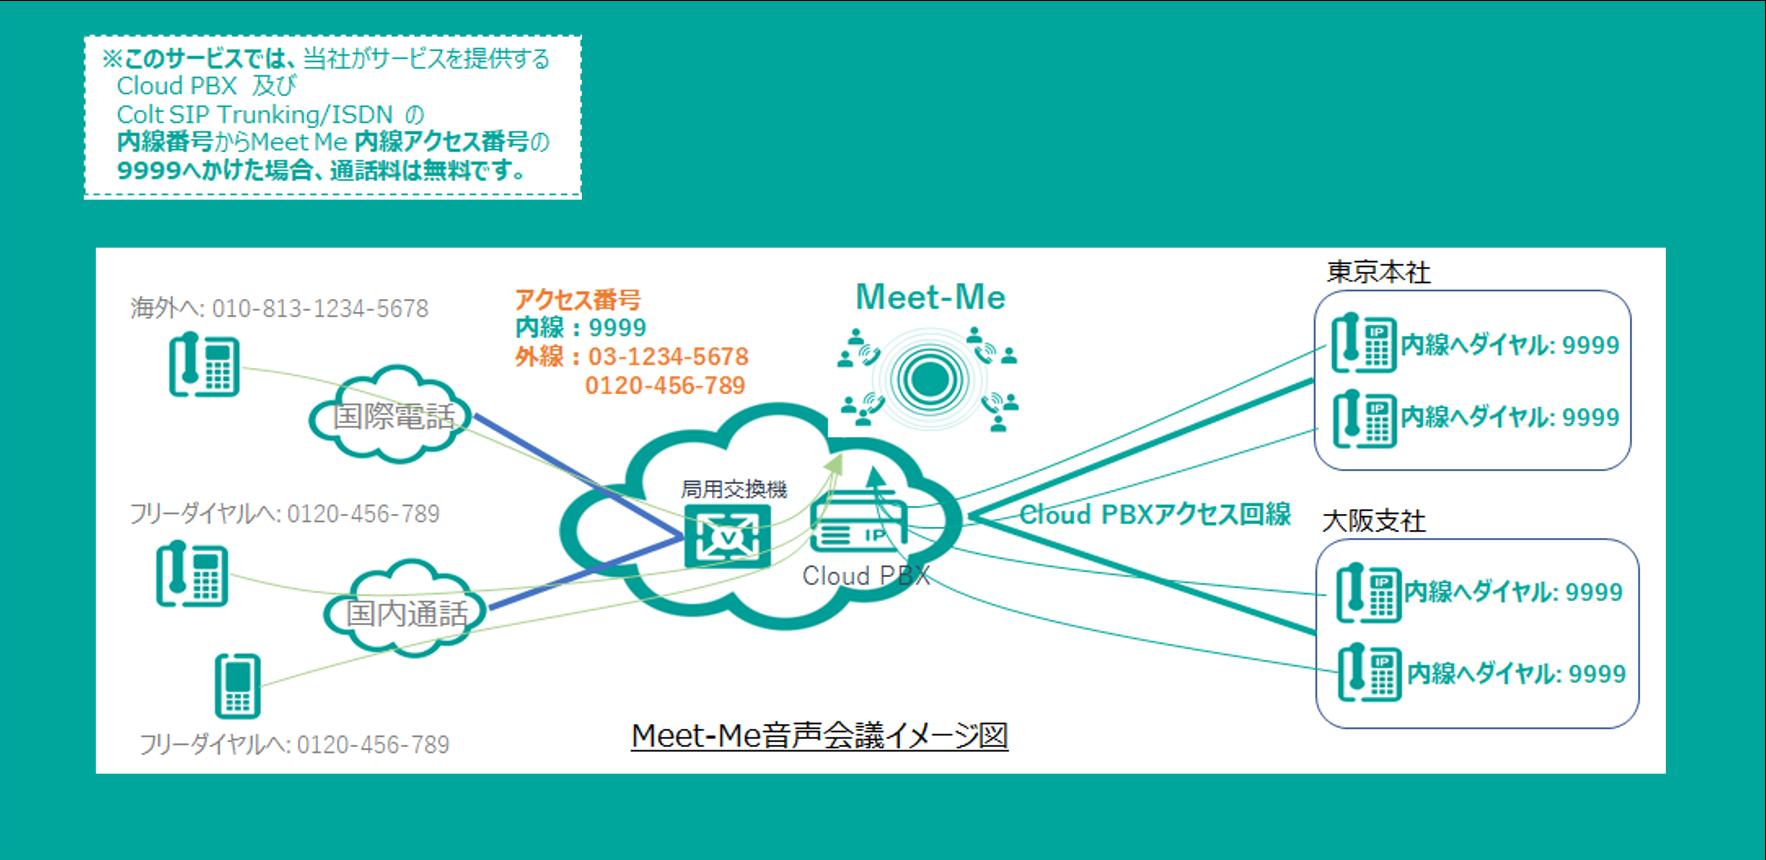 Colt Meet-Me 電話会議サービス